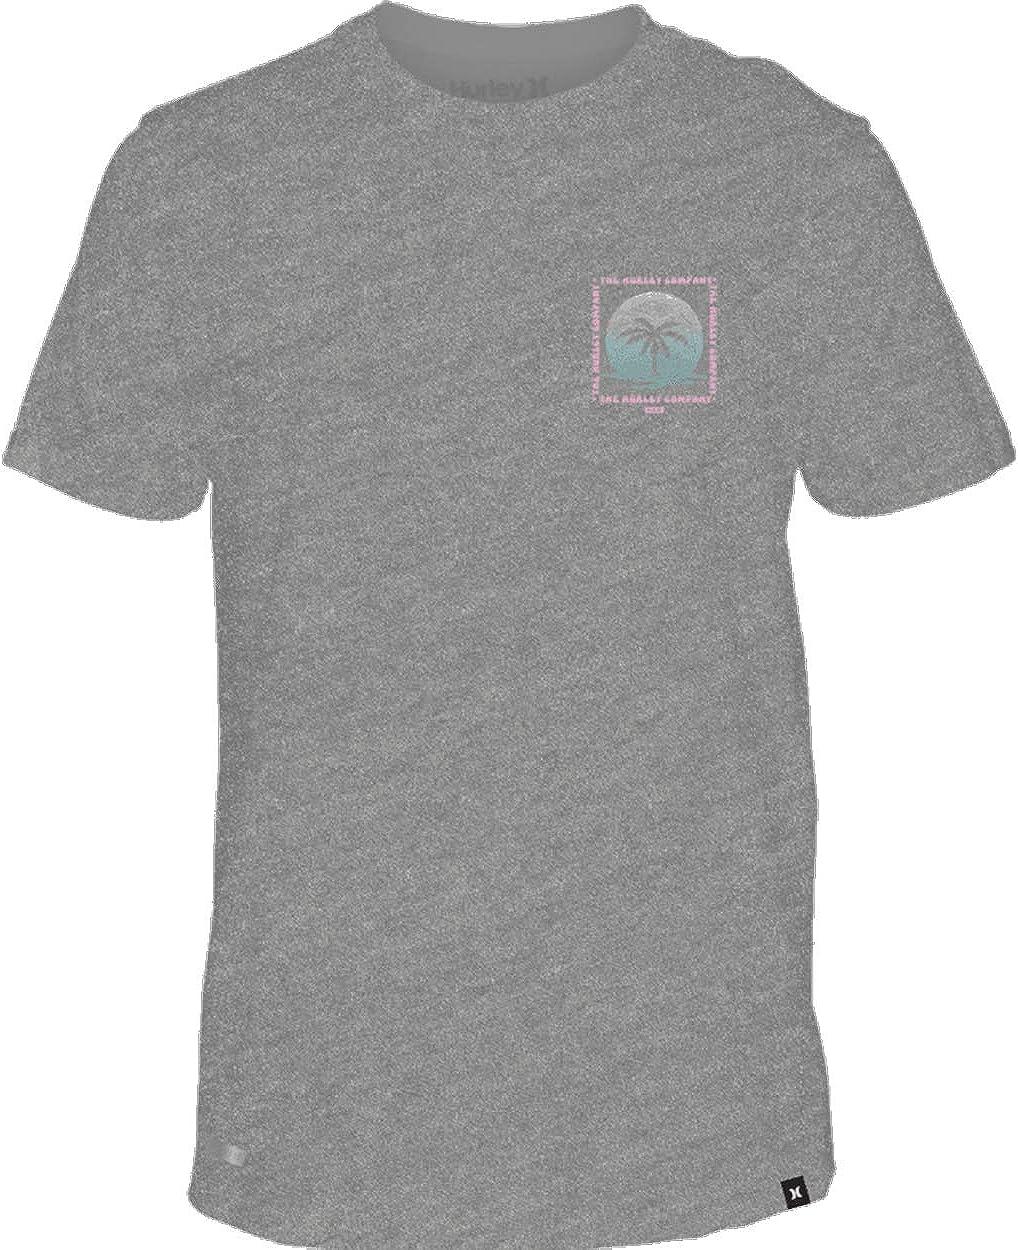 Hurley Men's Dri-Fit Trippy Palms Short Sleeve Shirt: Clothing